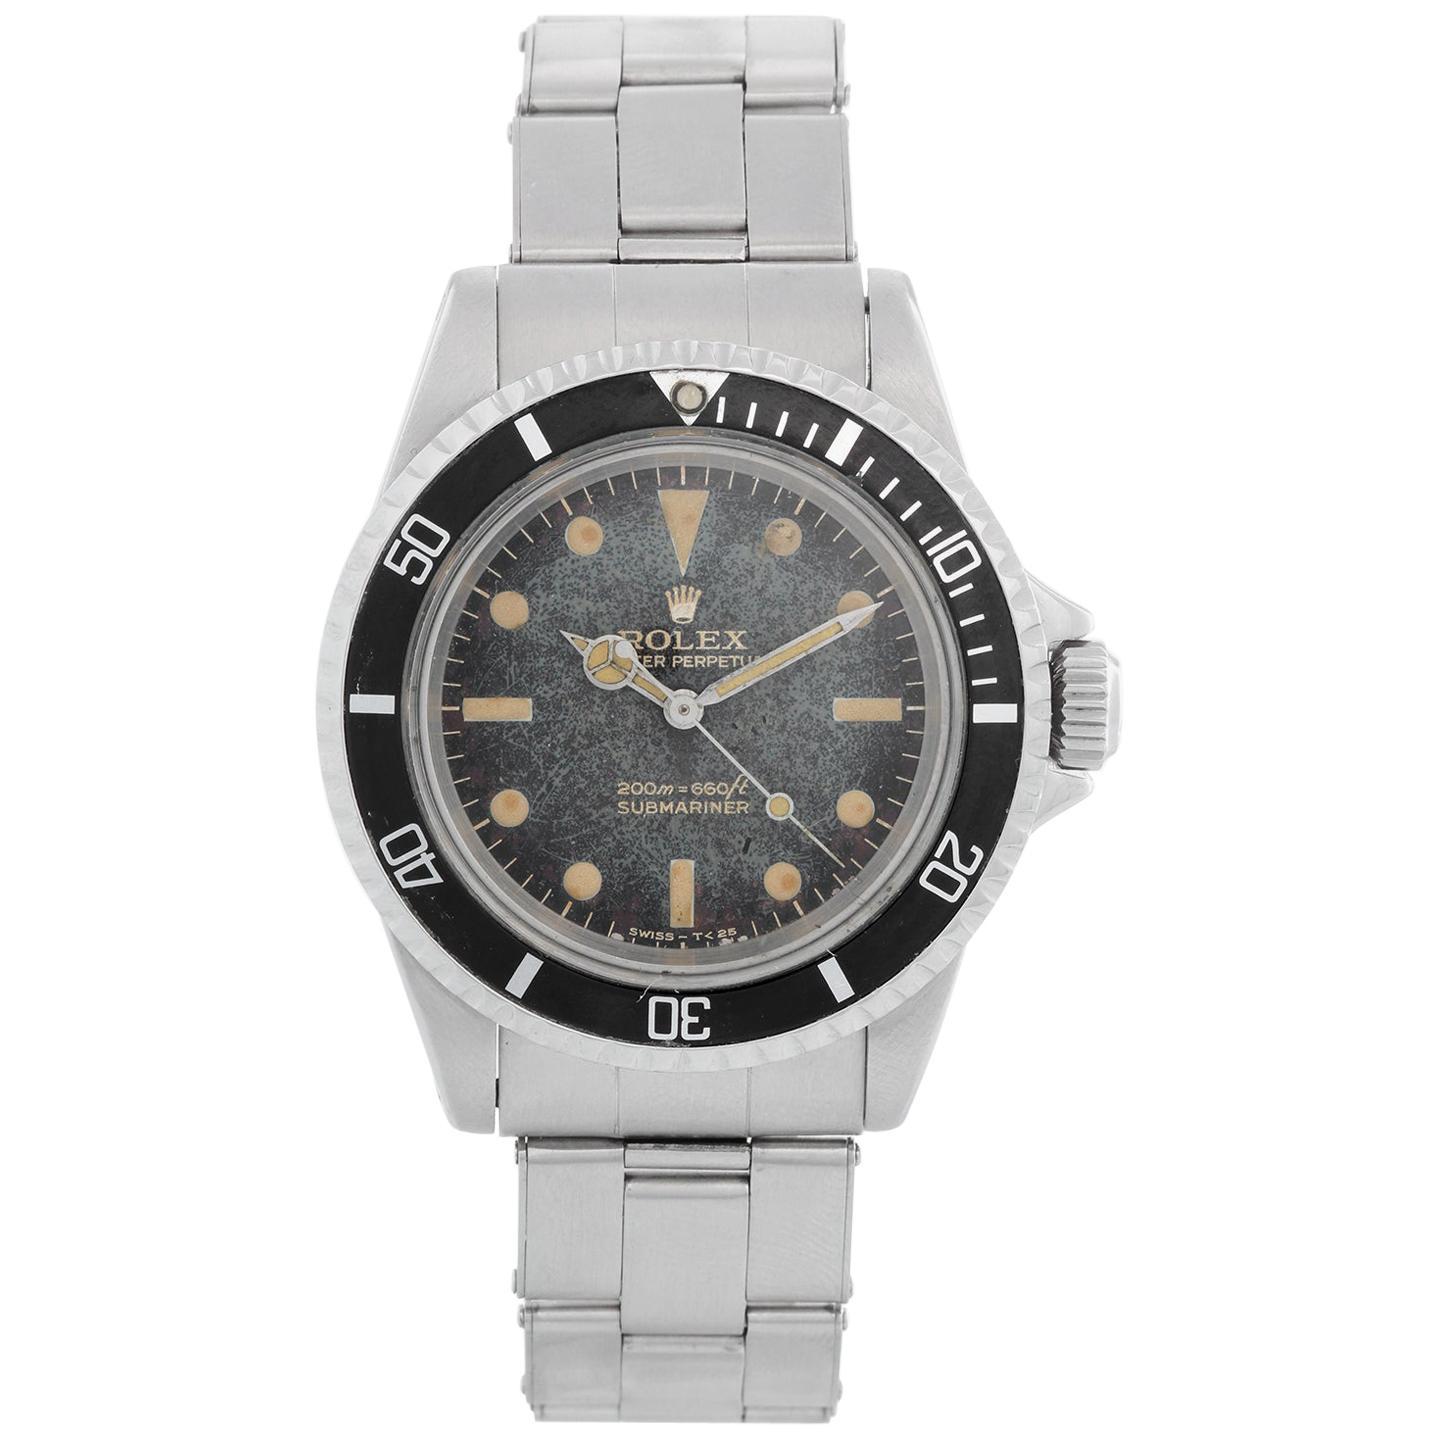 Vintage Rolex Submariner Gilt Dial Men's Automatic Watch 5513